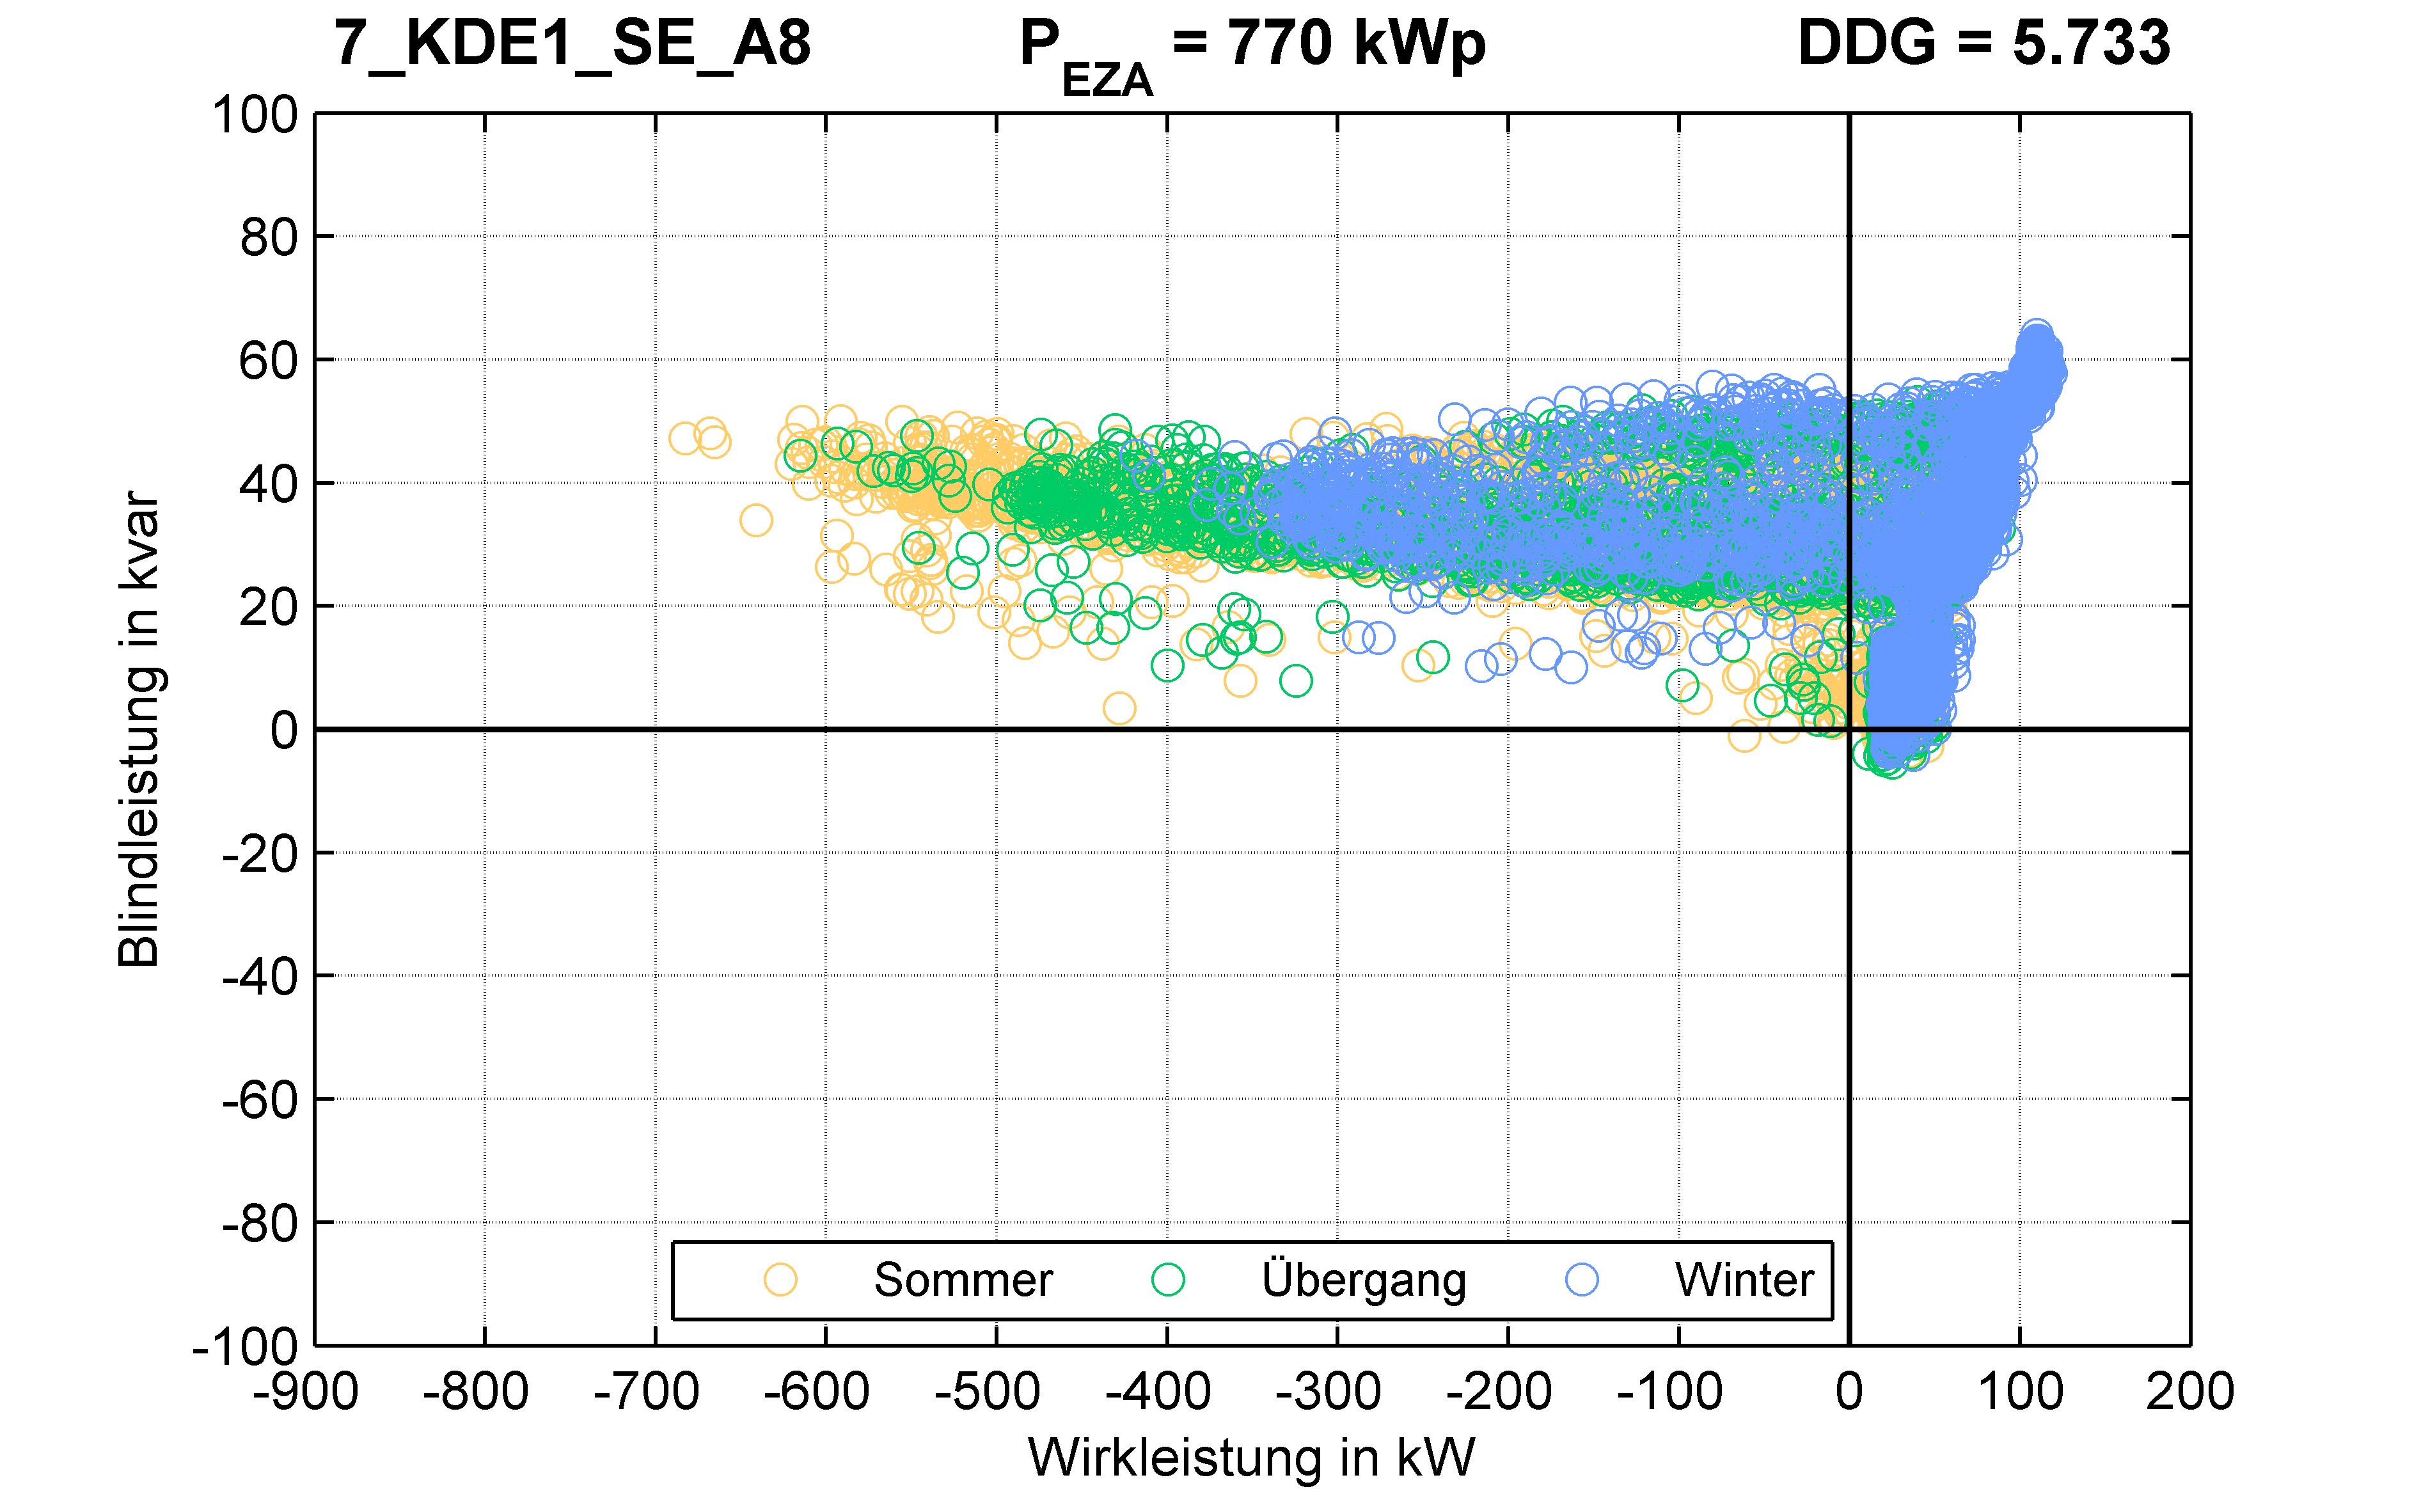 KDE1 | Längsregler (SE) A8 | PQ-Verhalten